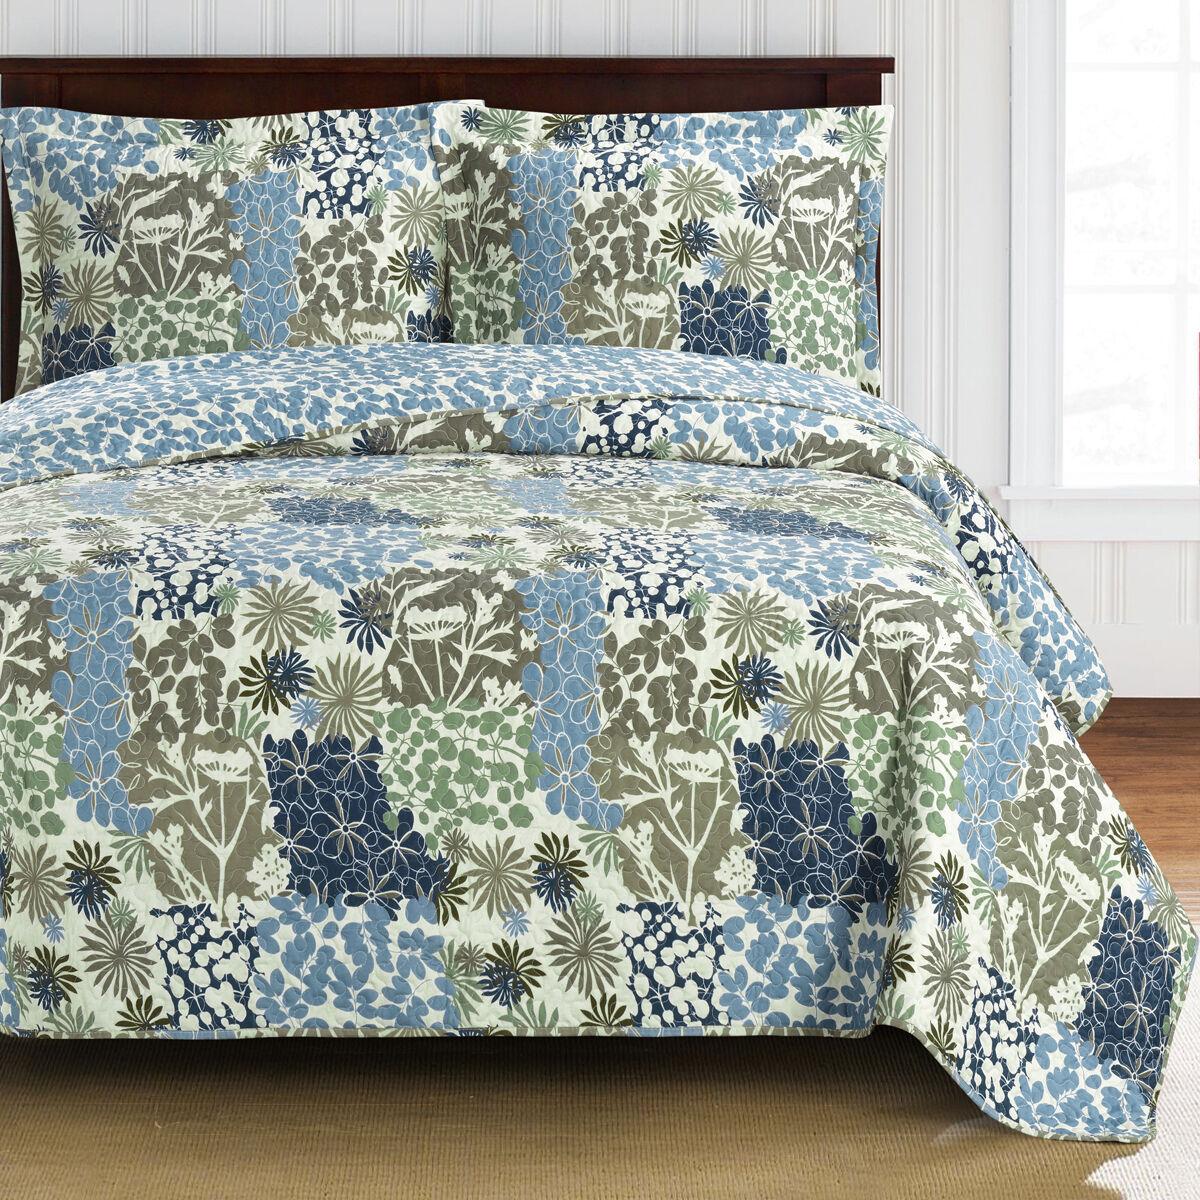 Elena OverGrößed Coverlet Set Luxury Microfiber Printed Quilt Modern Bedspread